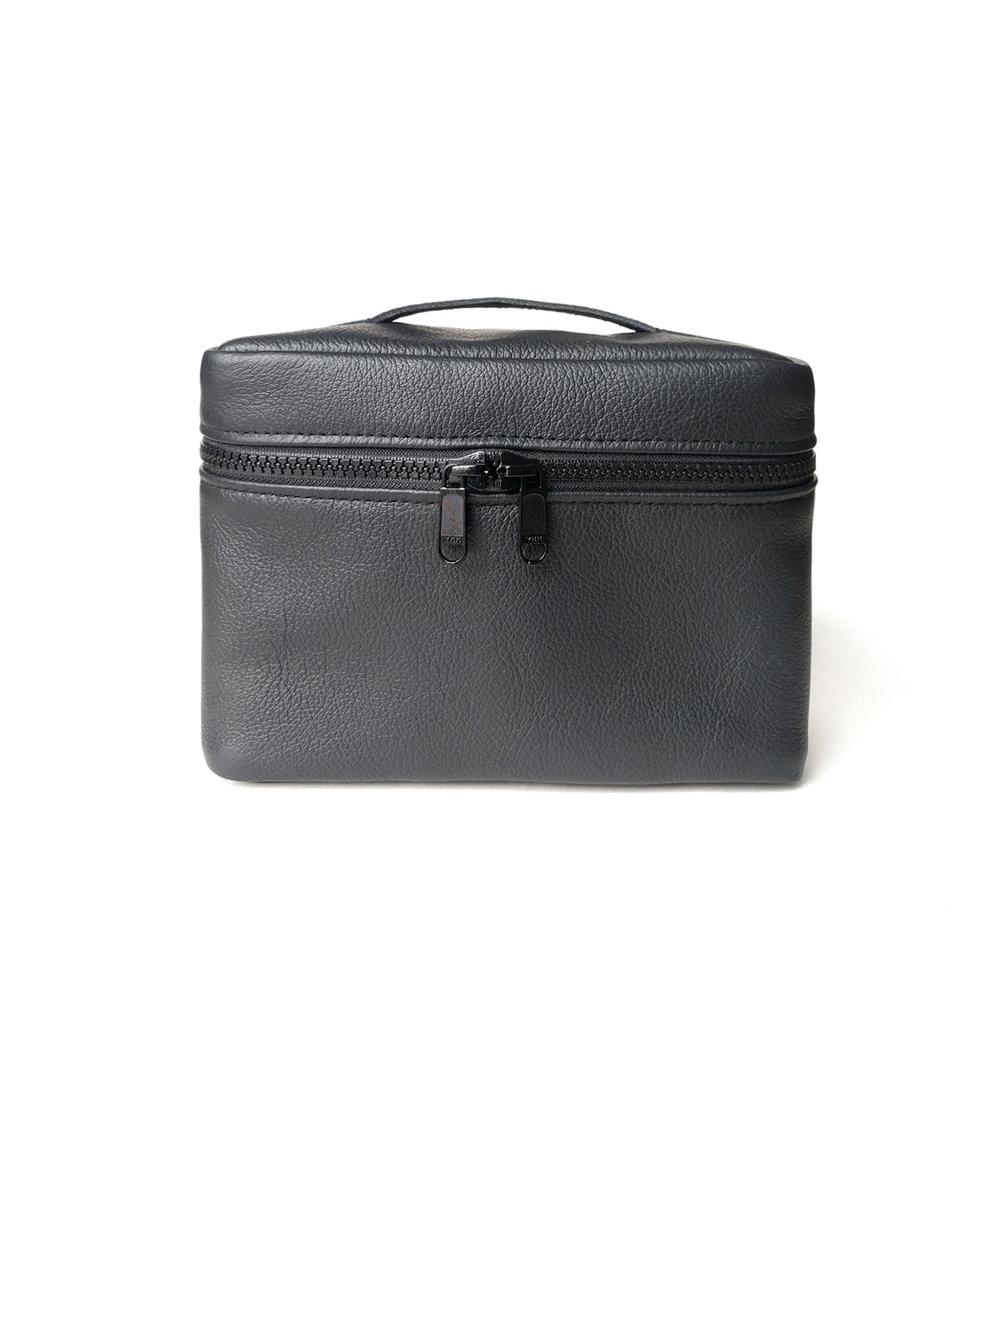 Box leather dopp kit - 90.00$